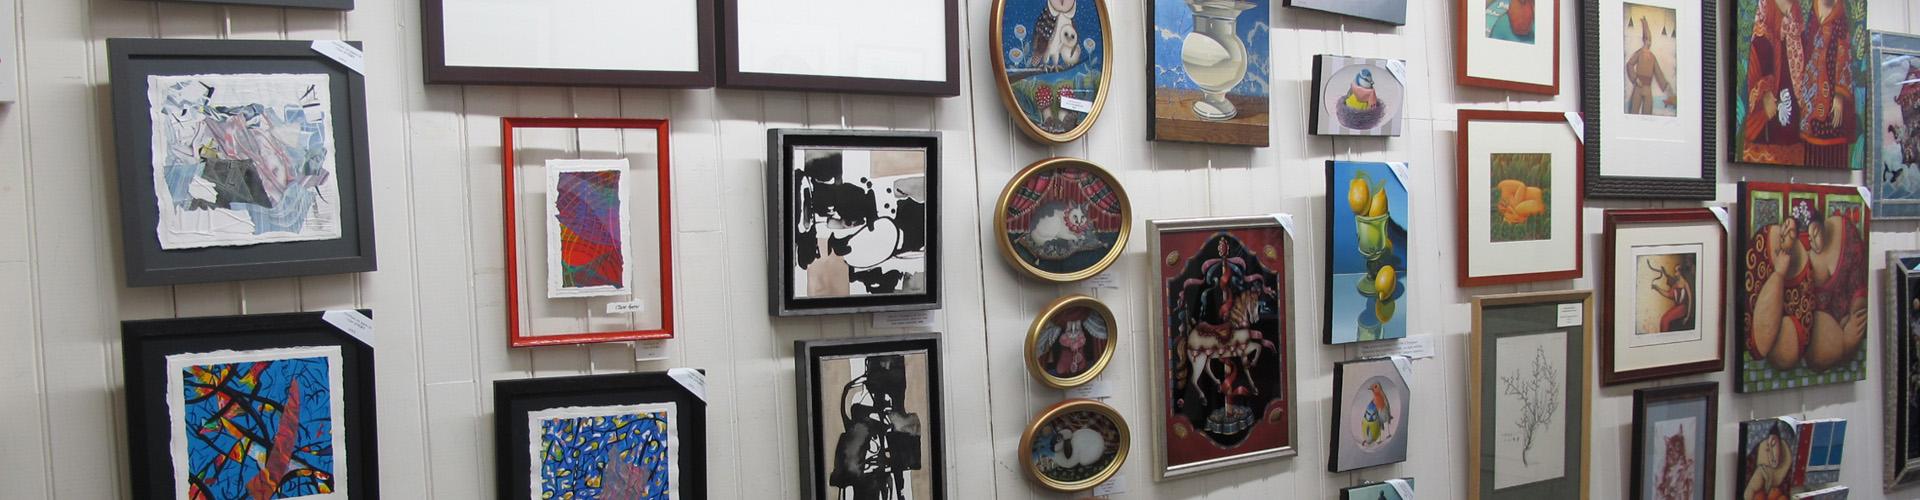 Le grenier de la Galerie